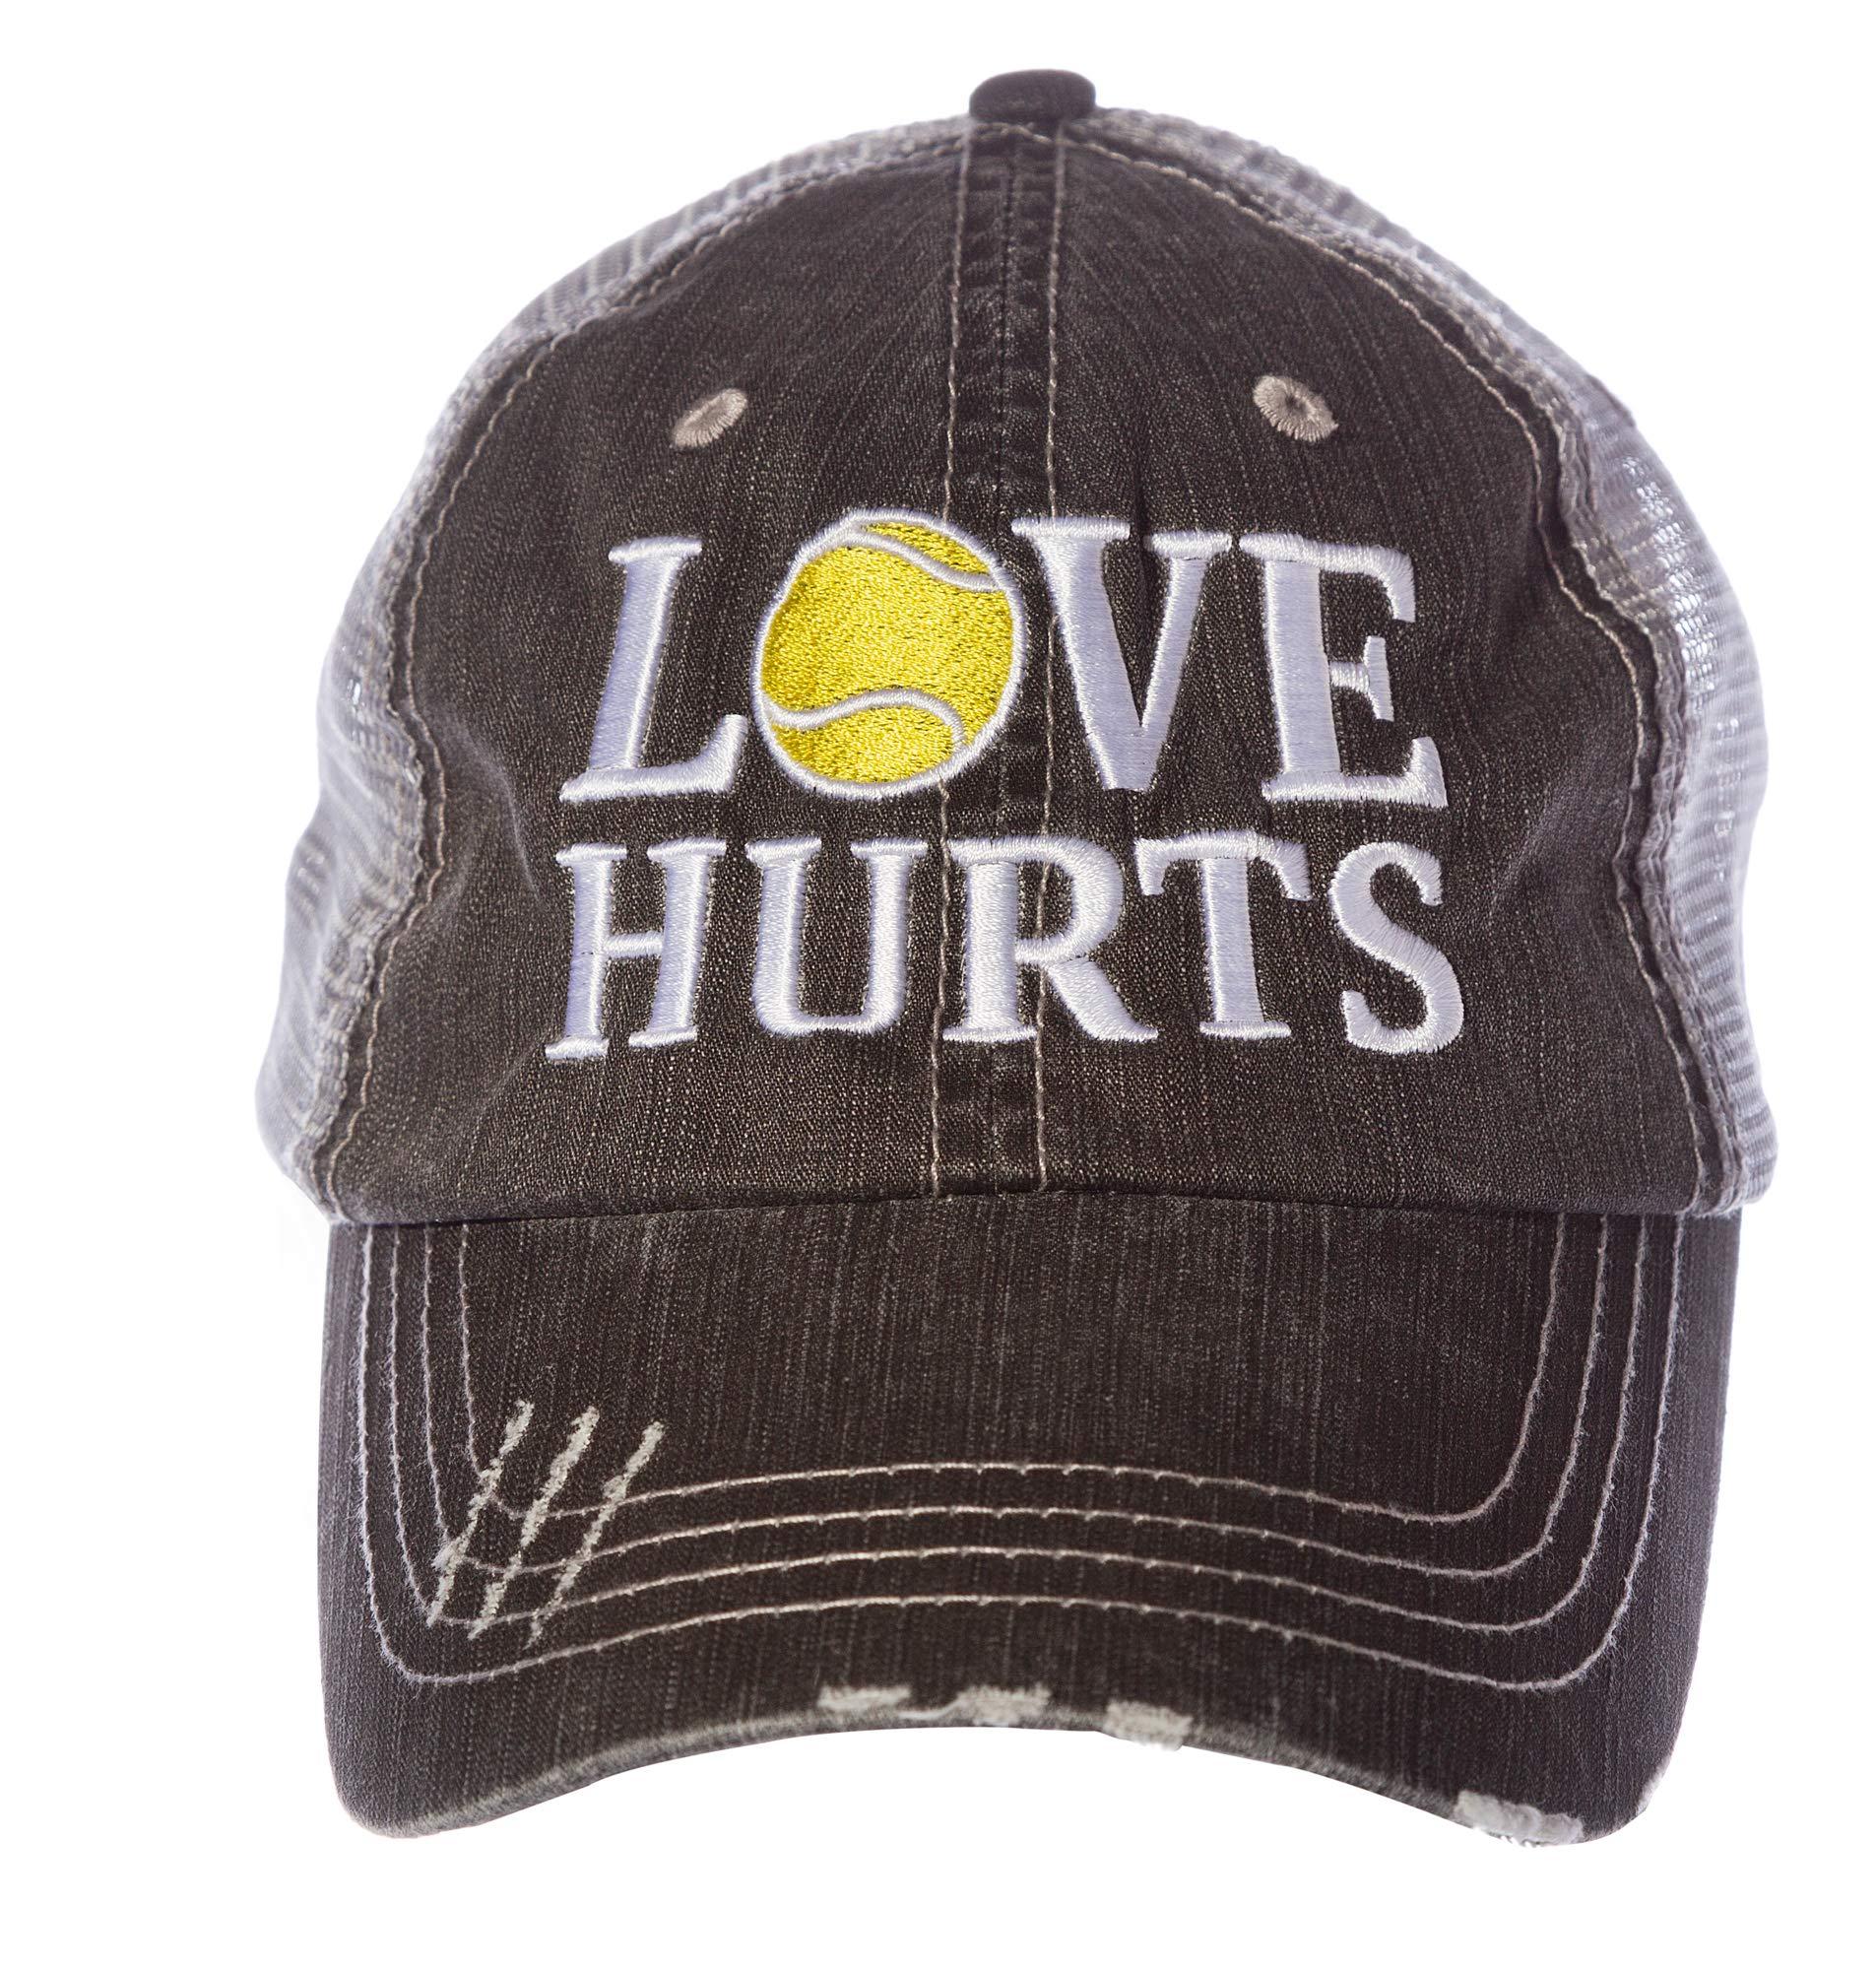 Tennis Addiction LOVE HURTS Women's Trucker Distressed Hat Cap Captain's Tennis Gift